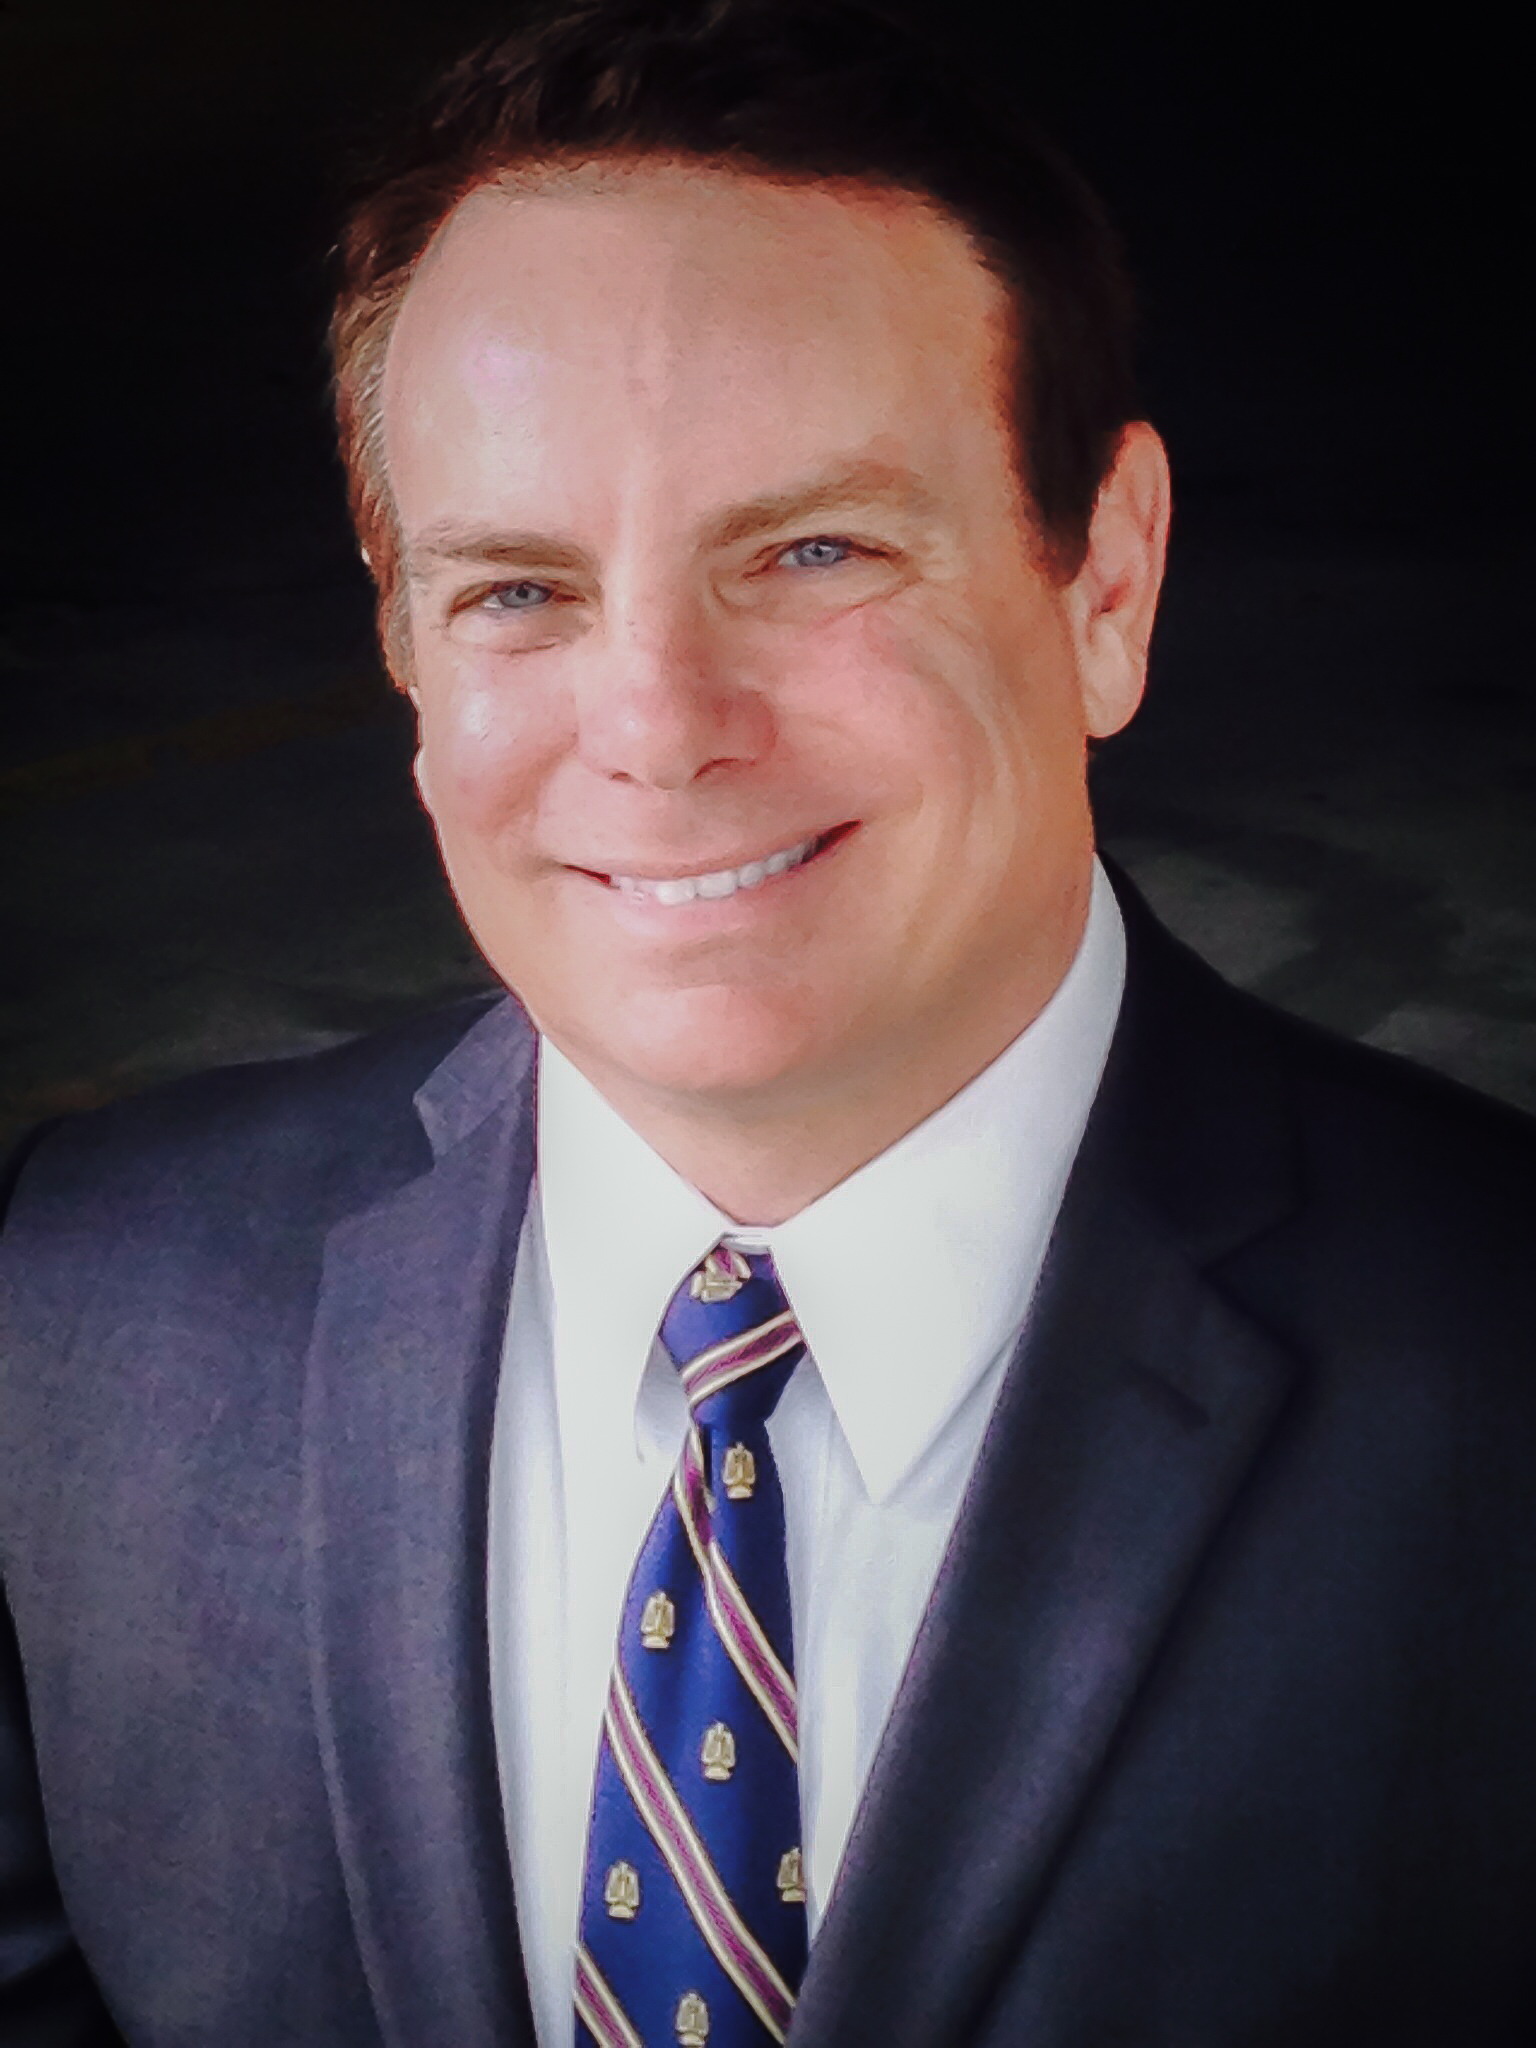 Stephen G. Cobb